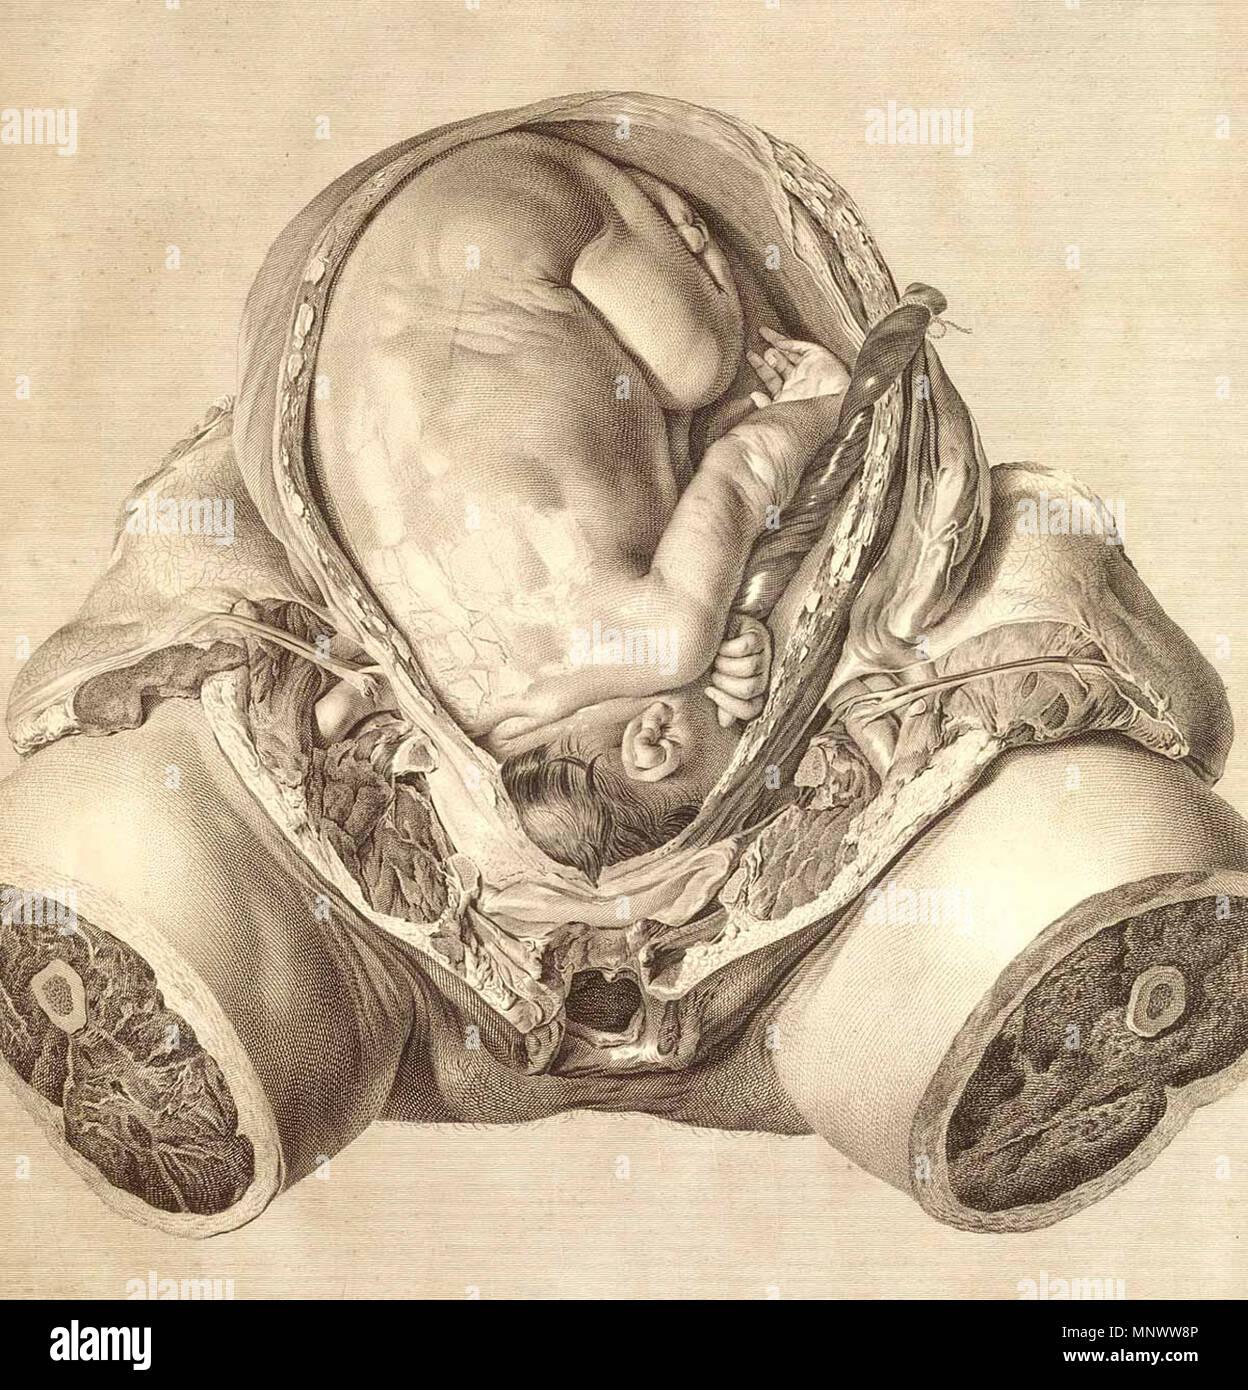 Asombroso Anatomía Aplicada De útero Adorno - Anatomía de Las ...